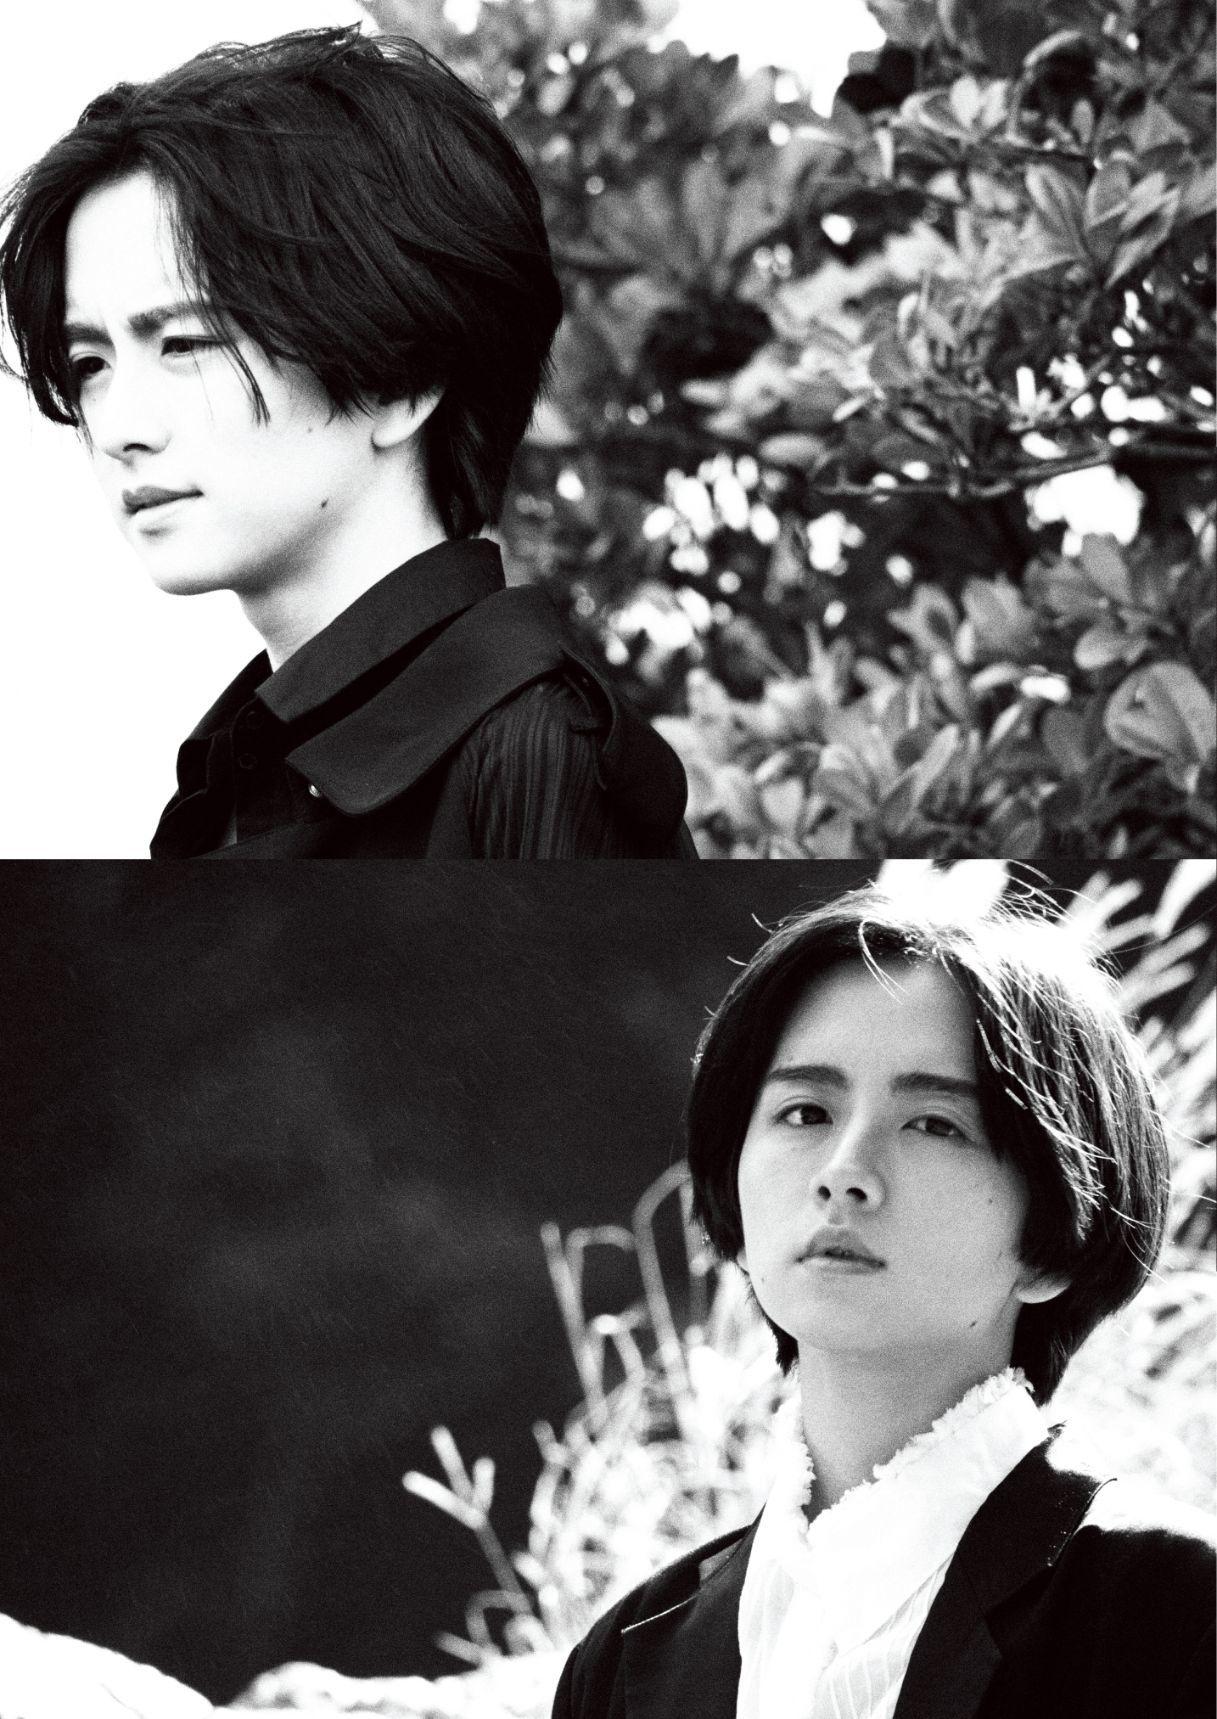 『Rihito18』写真集収録カット(三浦貴大撮影) (C)SDP